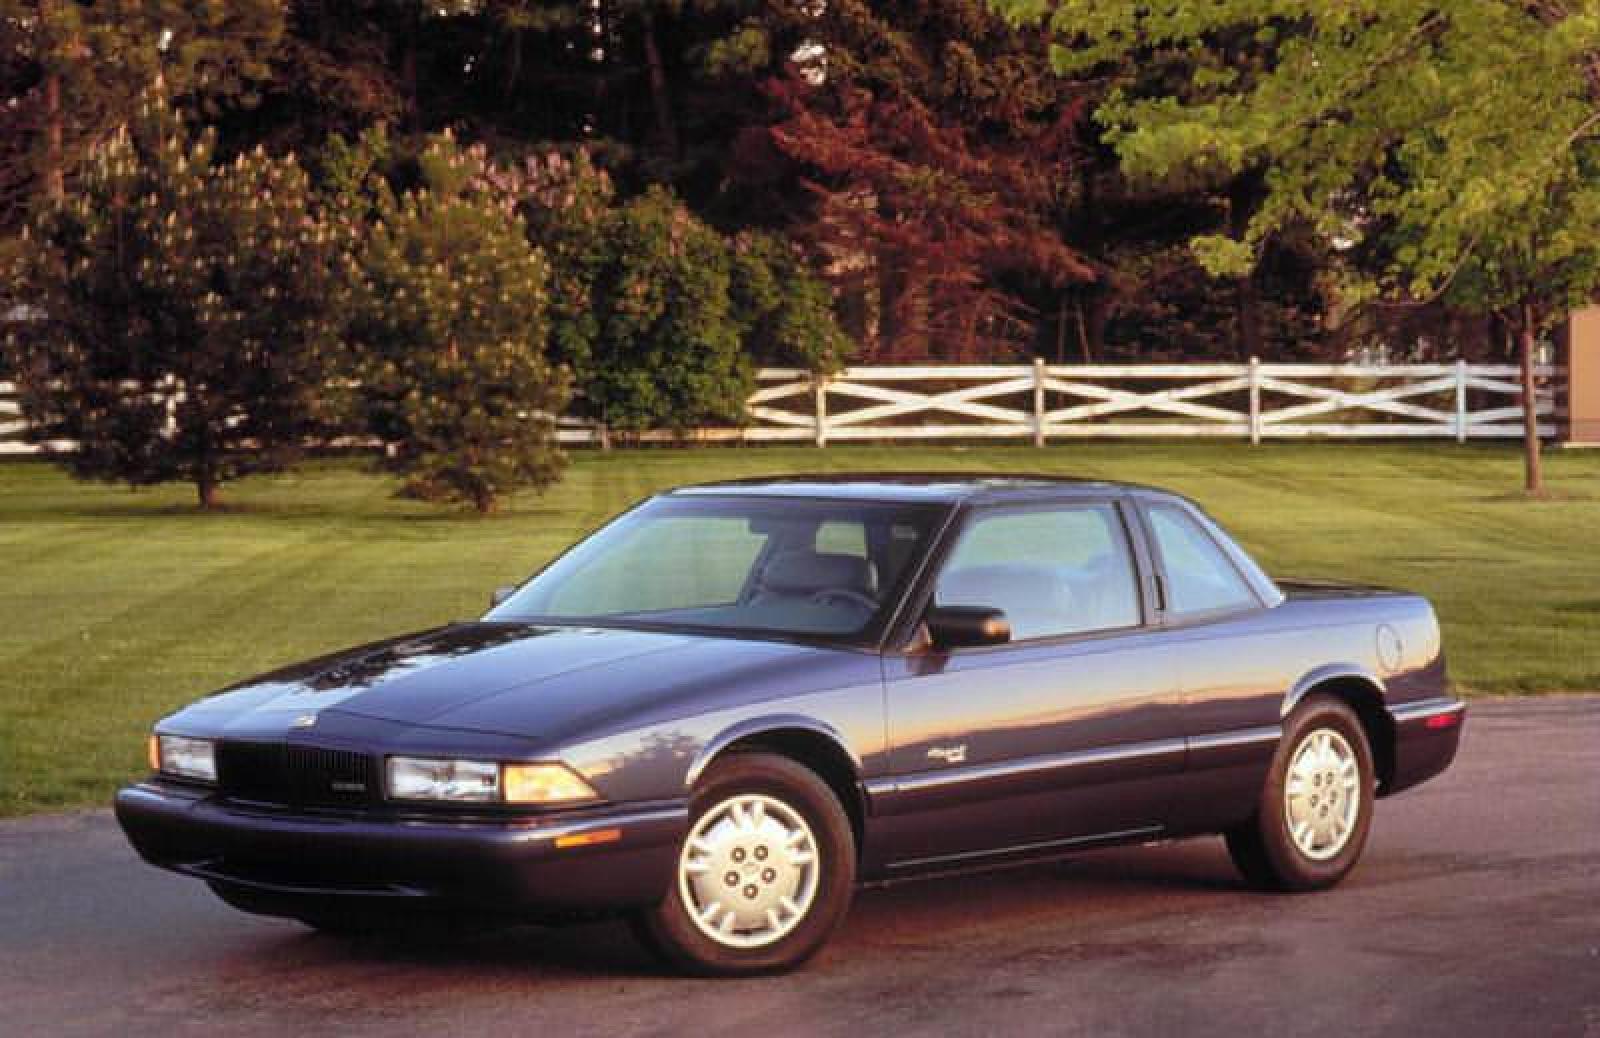 1992 Buick Regal Information And Photos Zombiedrive 1988 Engine Diagram 800 1024 1280 1600 Origin